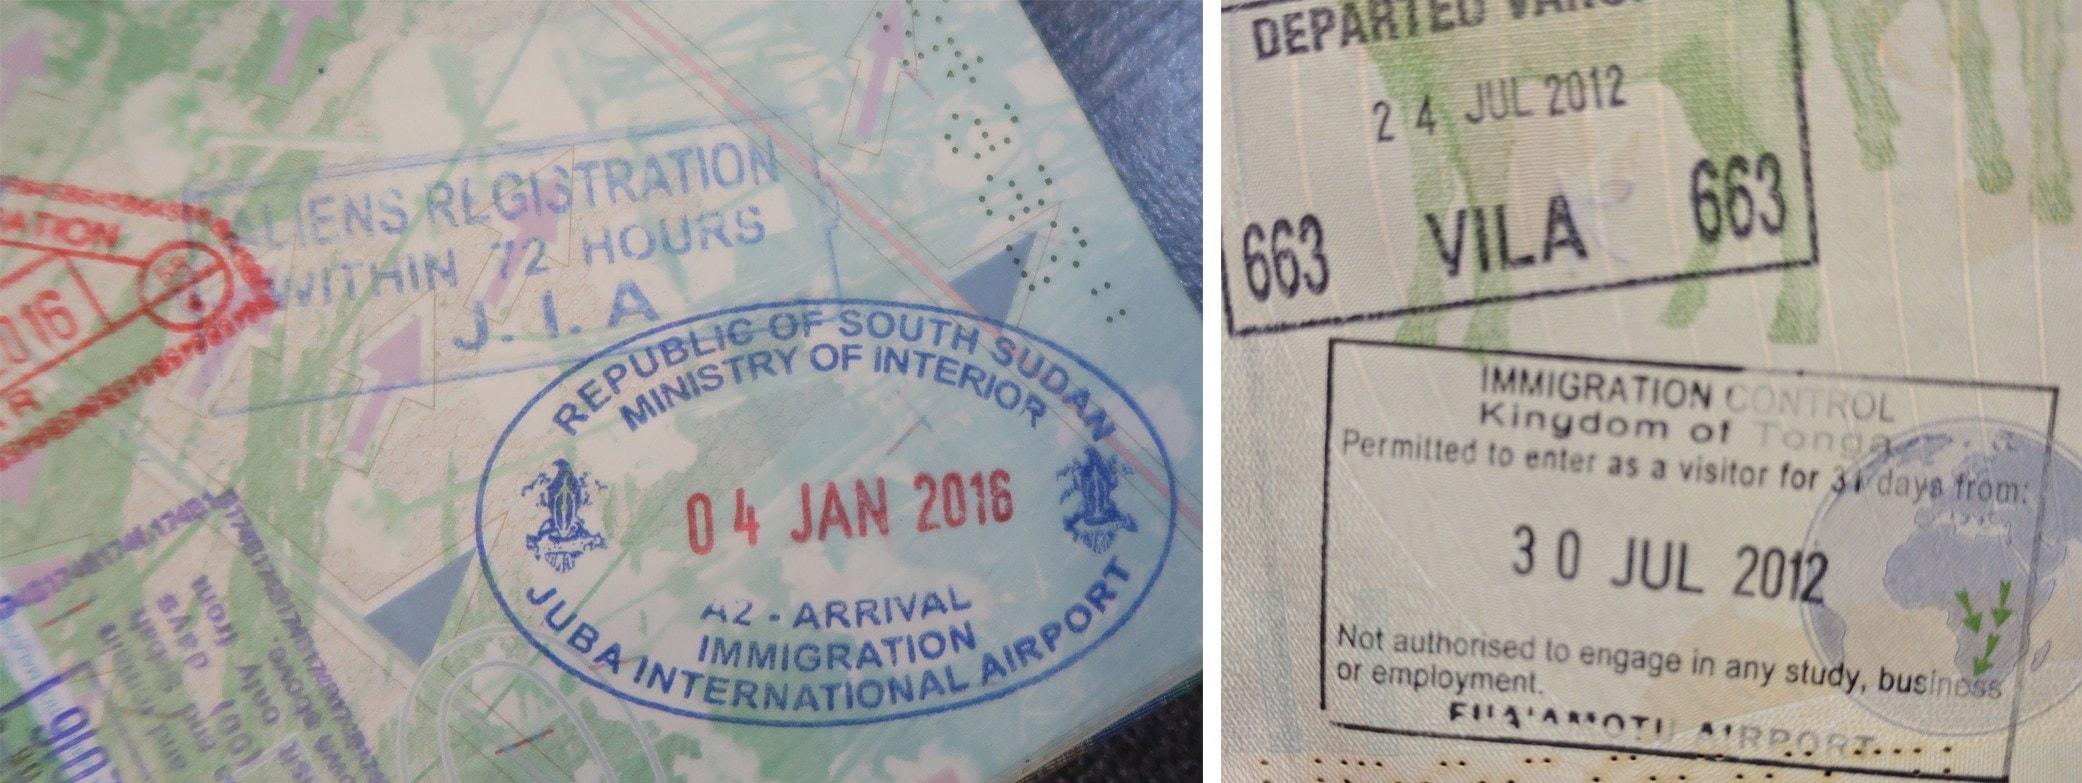 Passport Stamps For South Sudan And Tonga